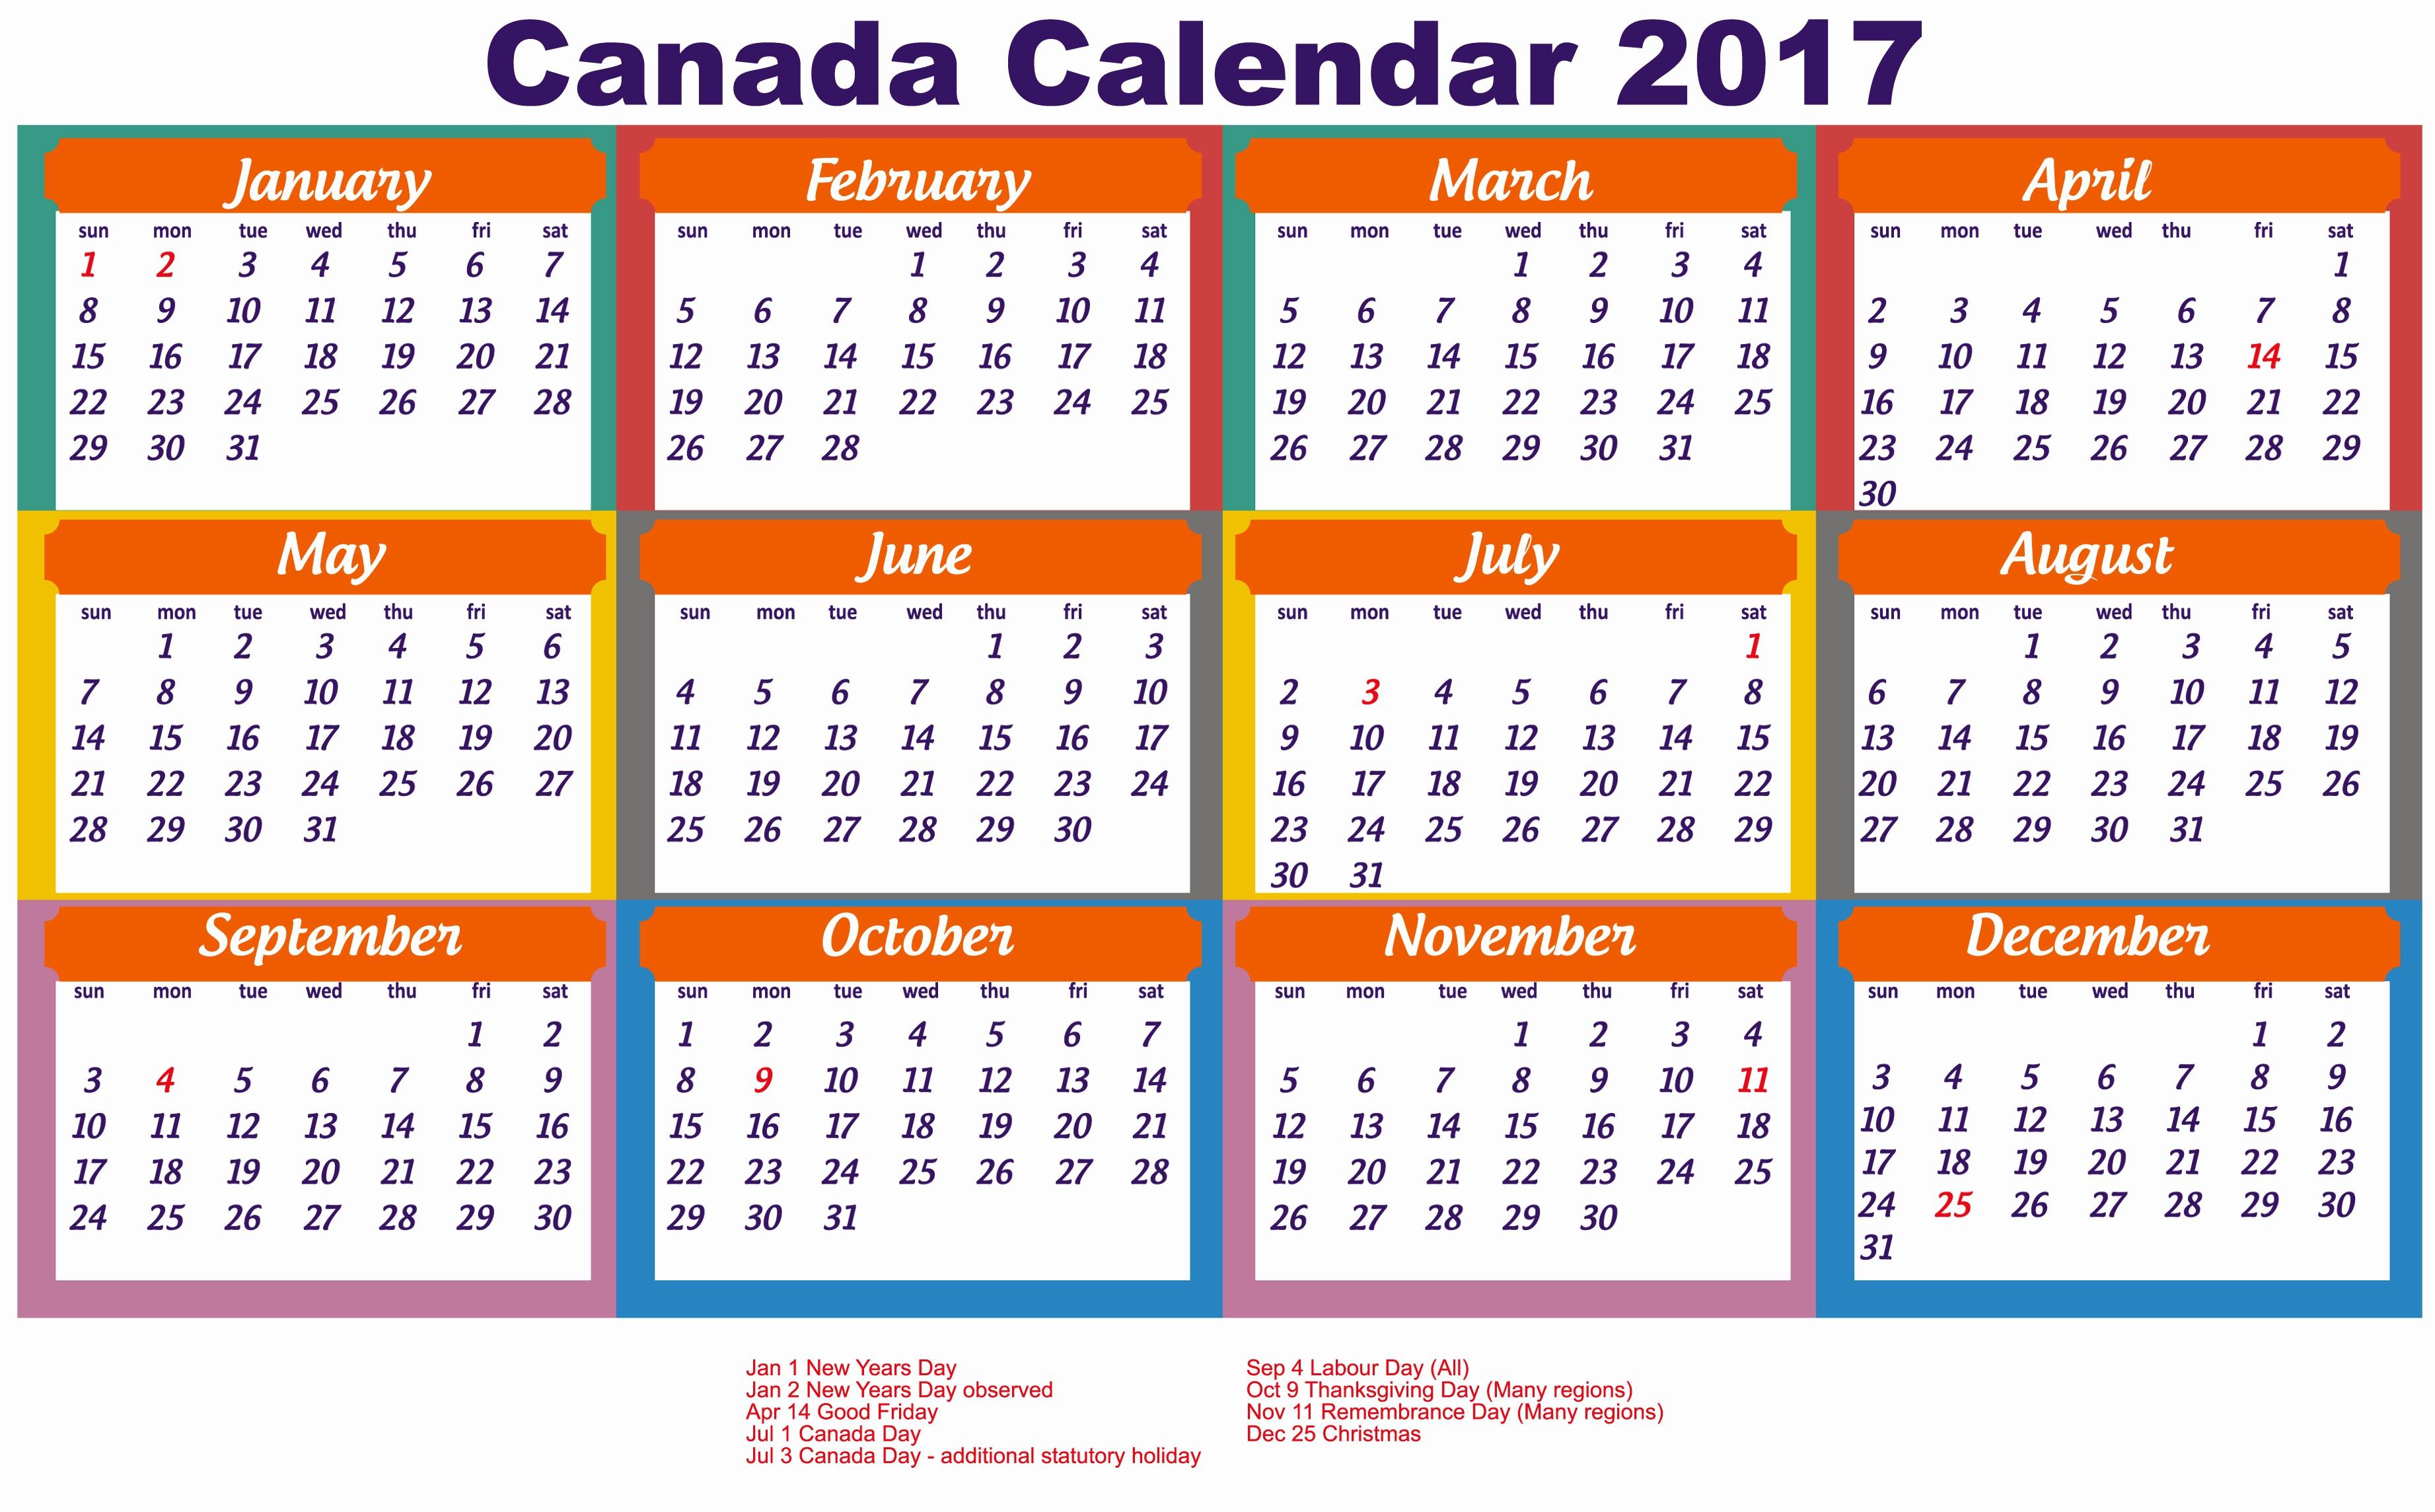 Free Printable Annual Calendar 2017 Awesome 2017 Calendar Canada